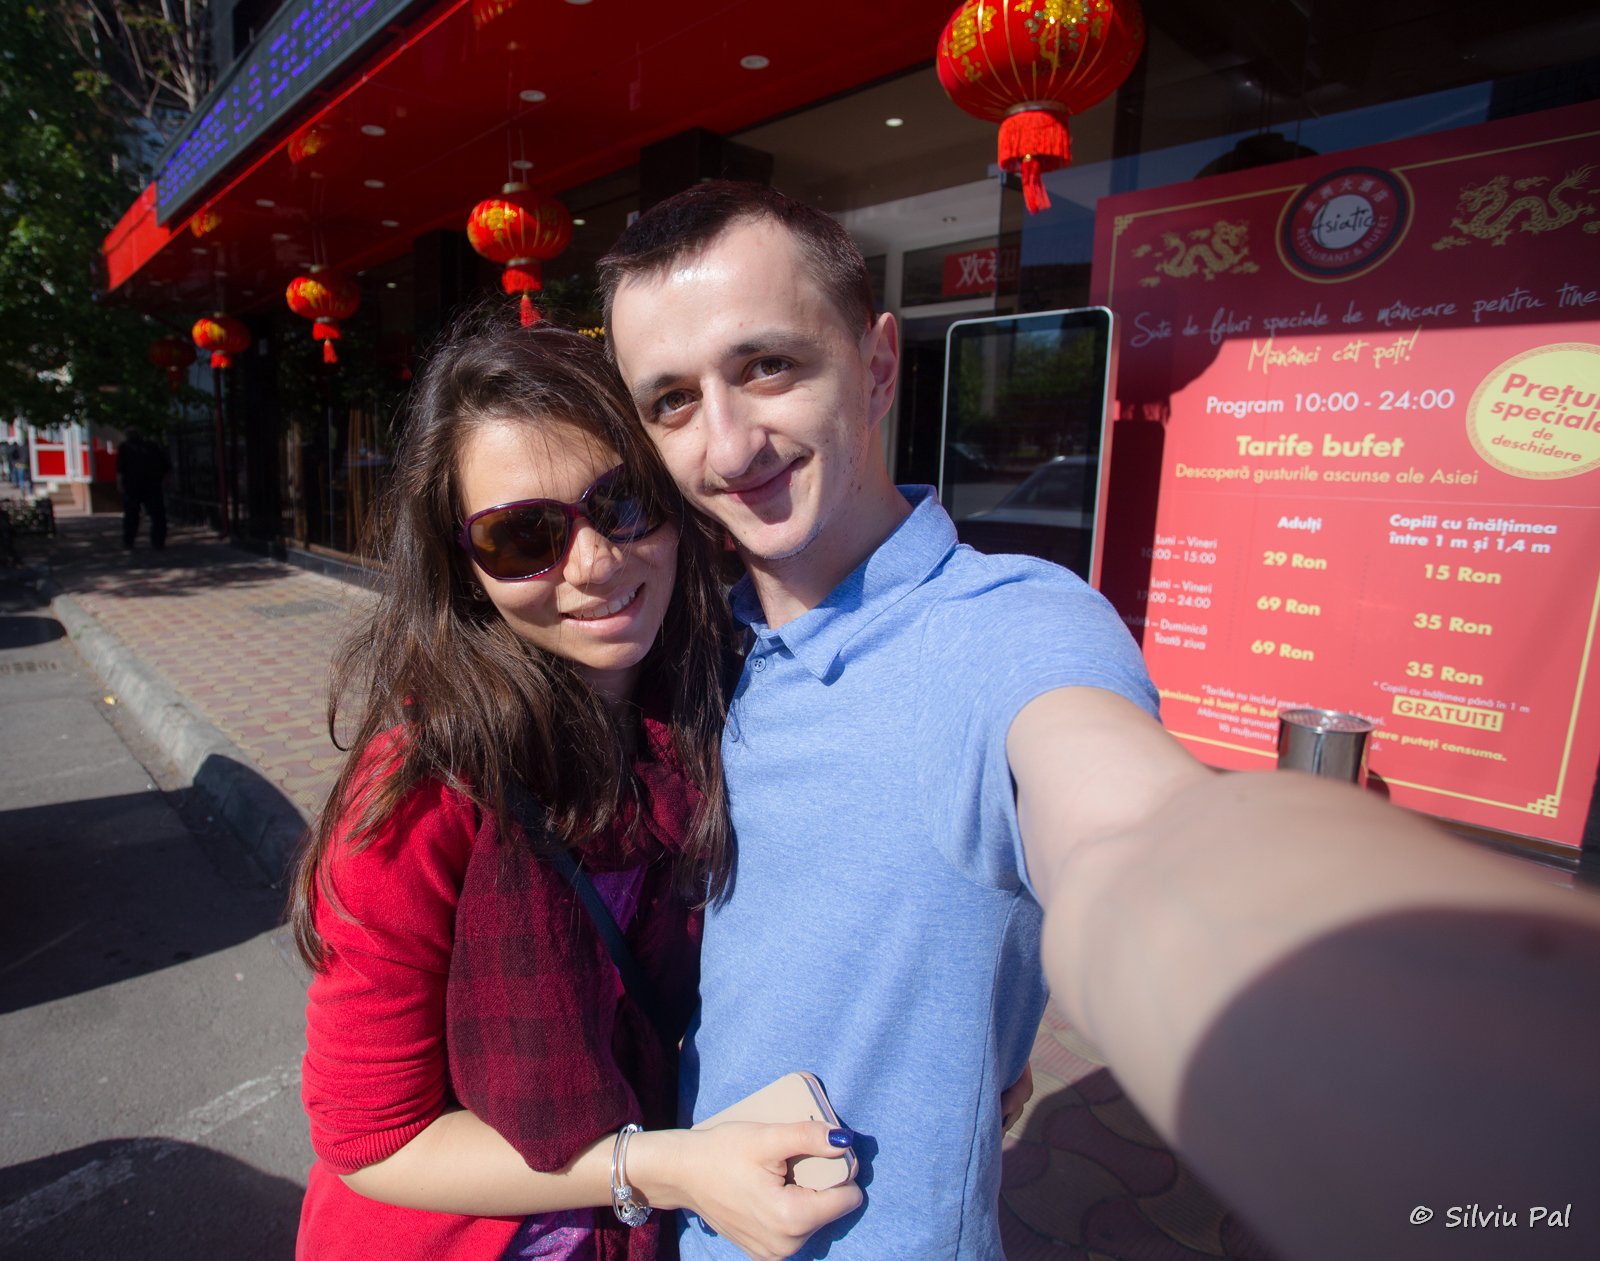 Restaurant & Bufet asiatic - HtagPR - Silviu Pal Blog